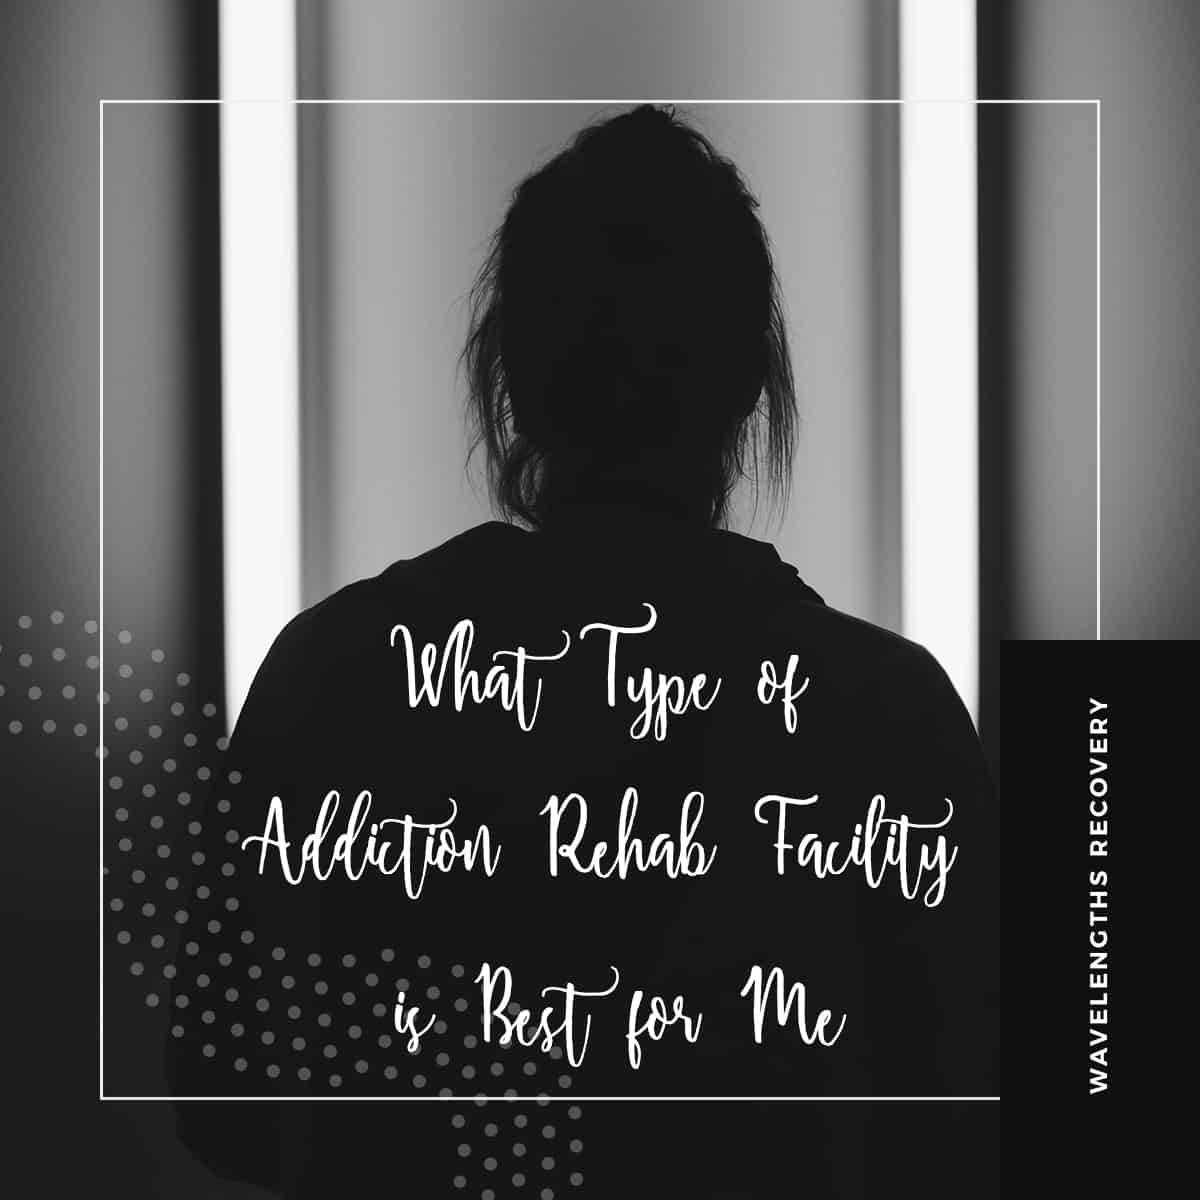 Addiction Rehab Facility Wavelengths